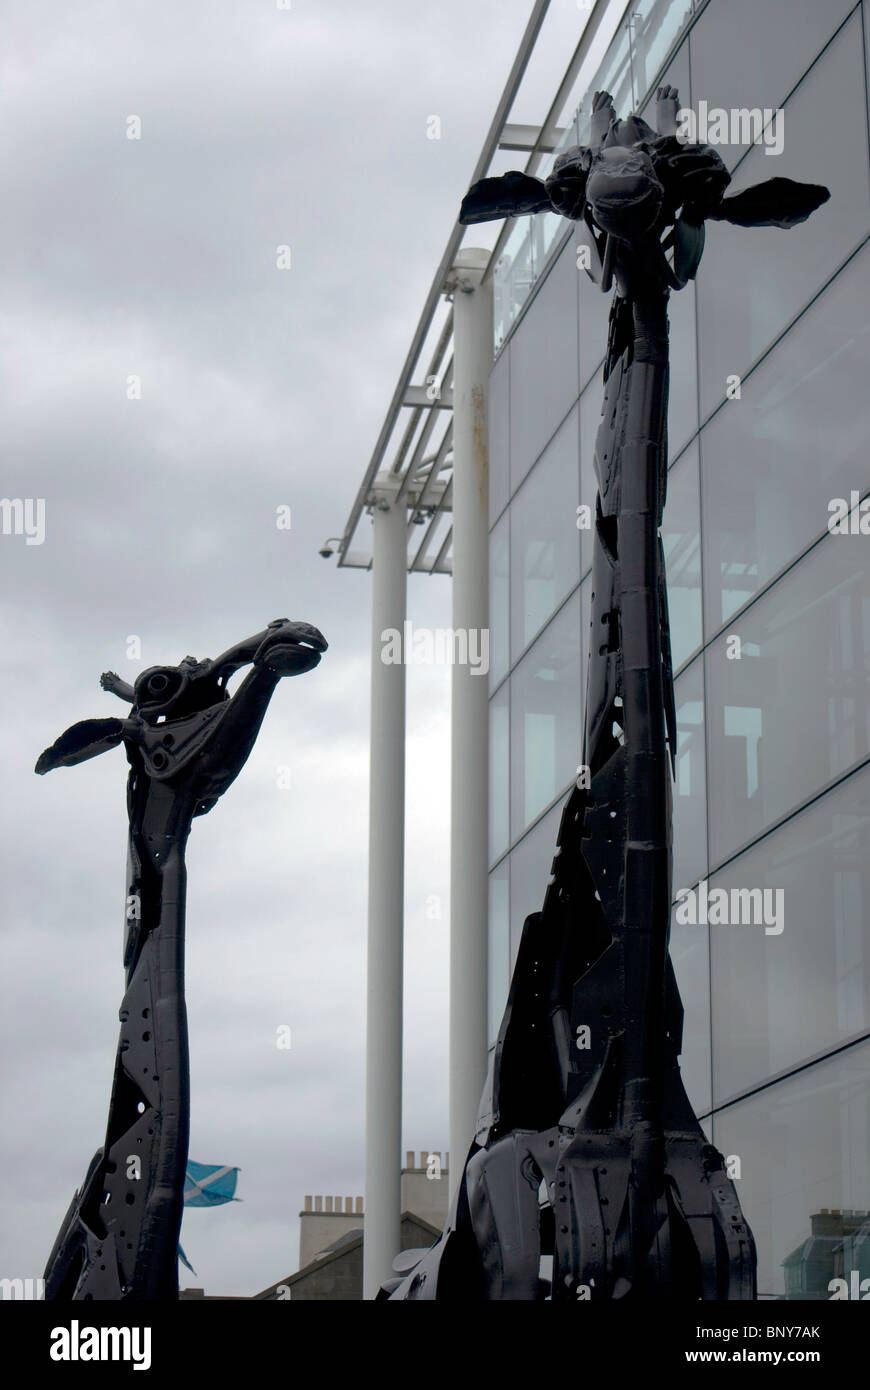 Giraffe sculptures made from metal car (automobile) parts outside the Omni Centre in Edinburgh, Scotland. Stock Photo